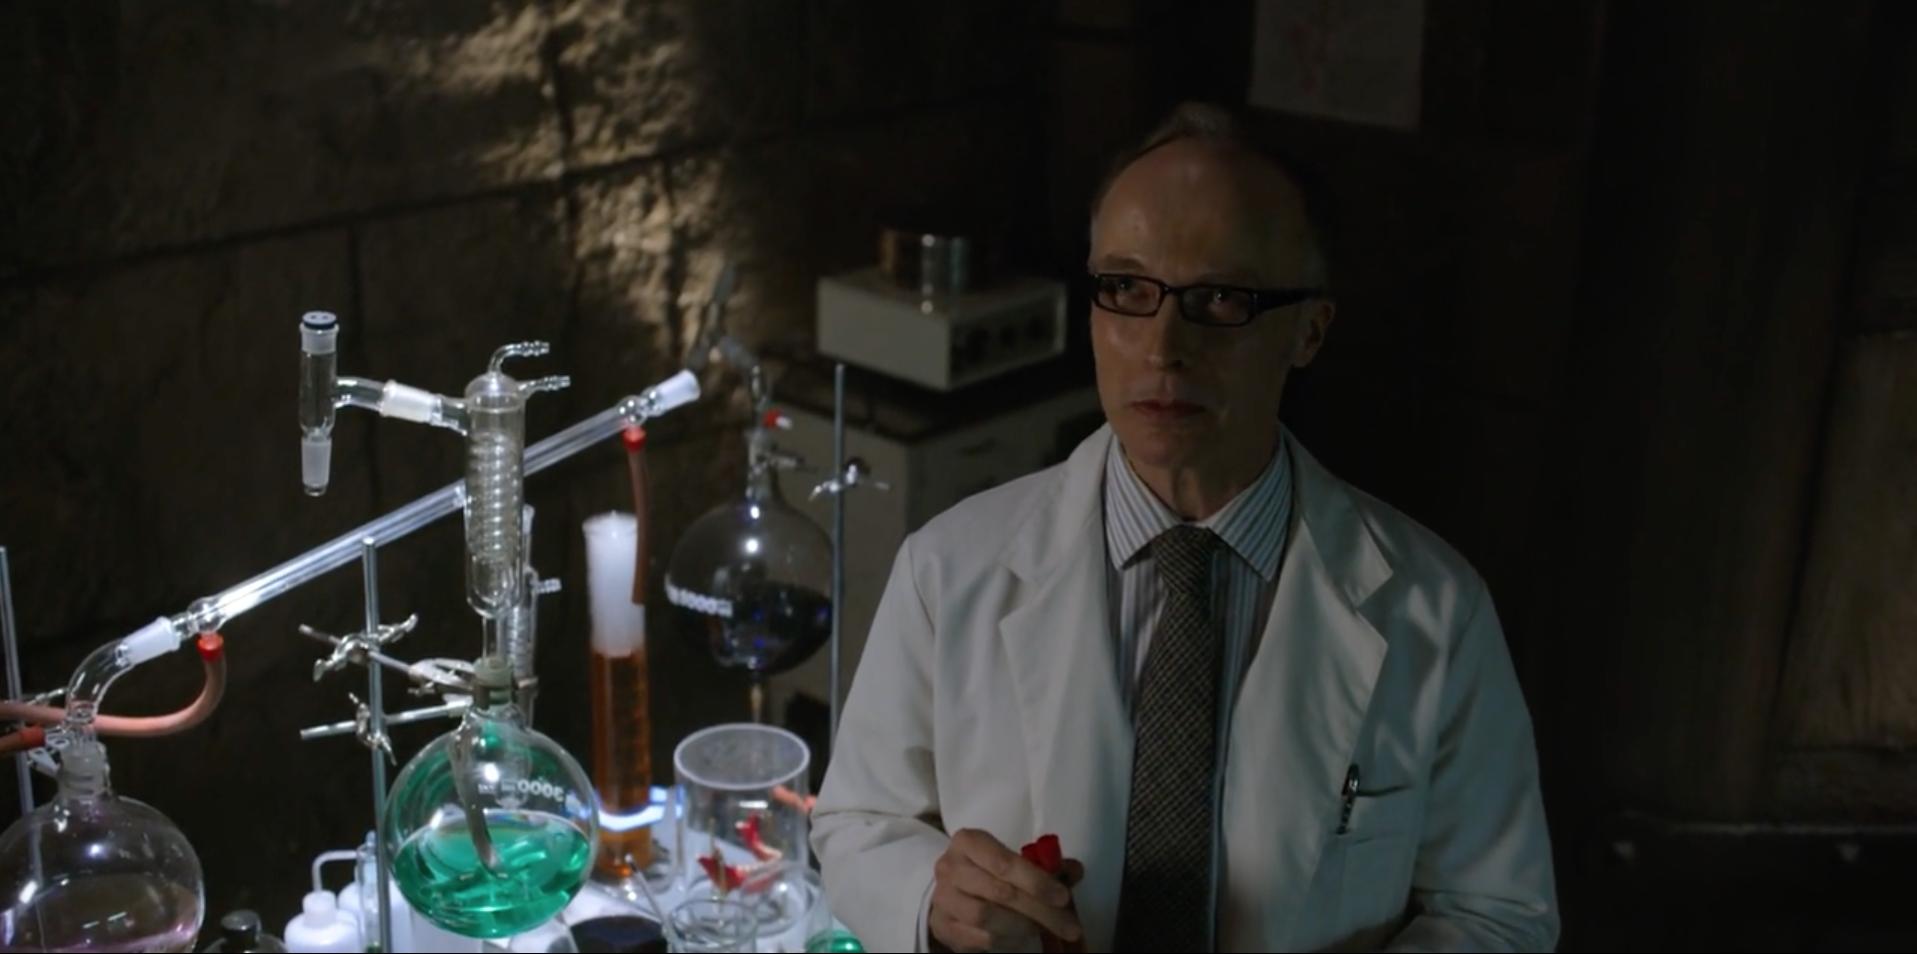 Dr. Karamazov, THE TICK